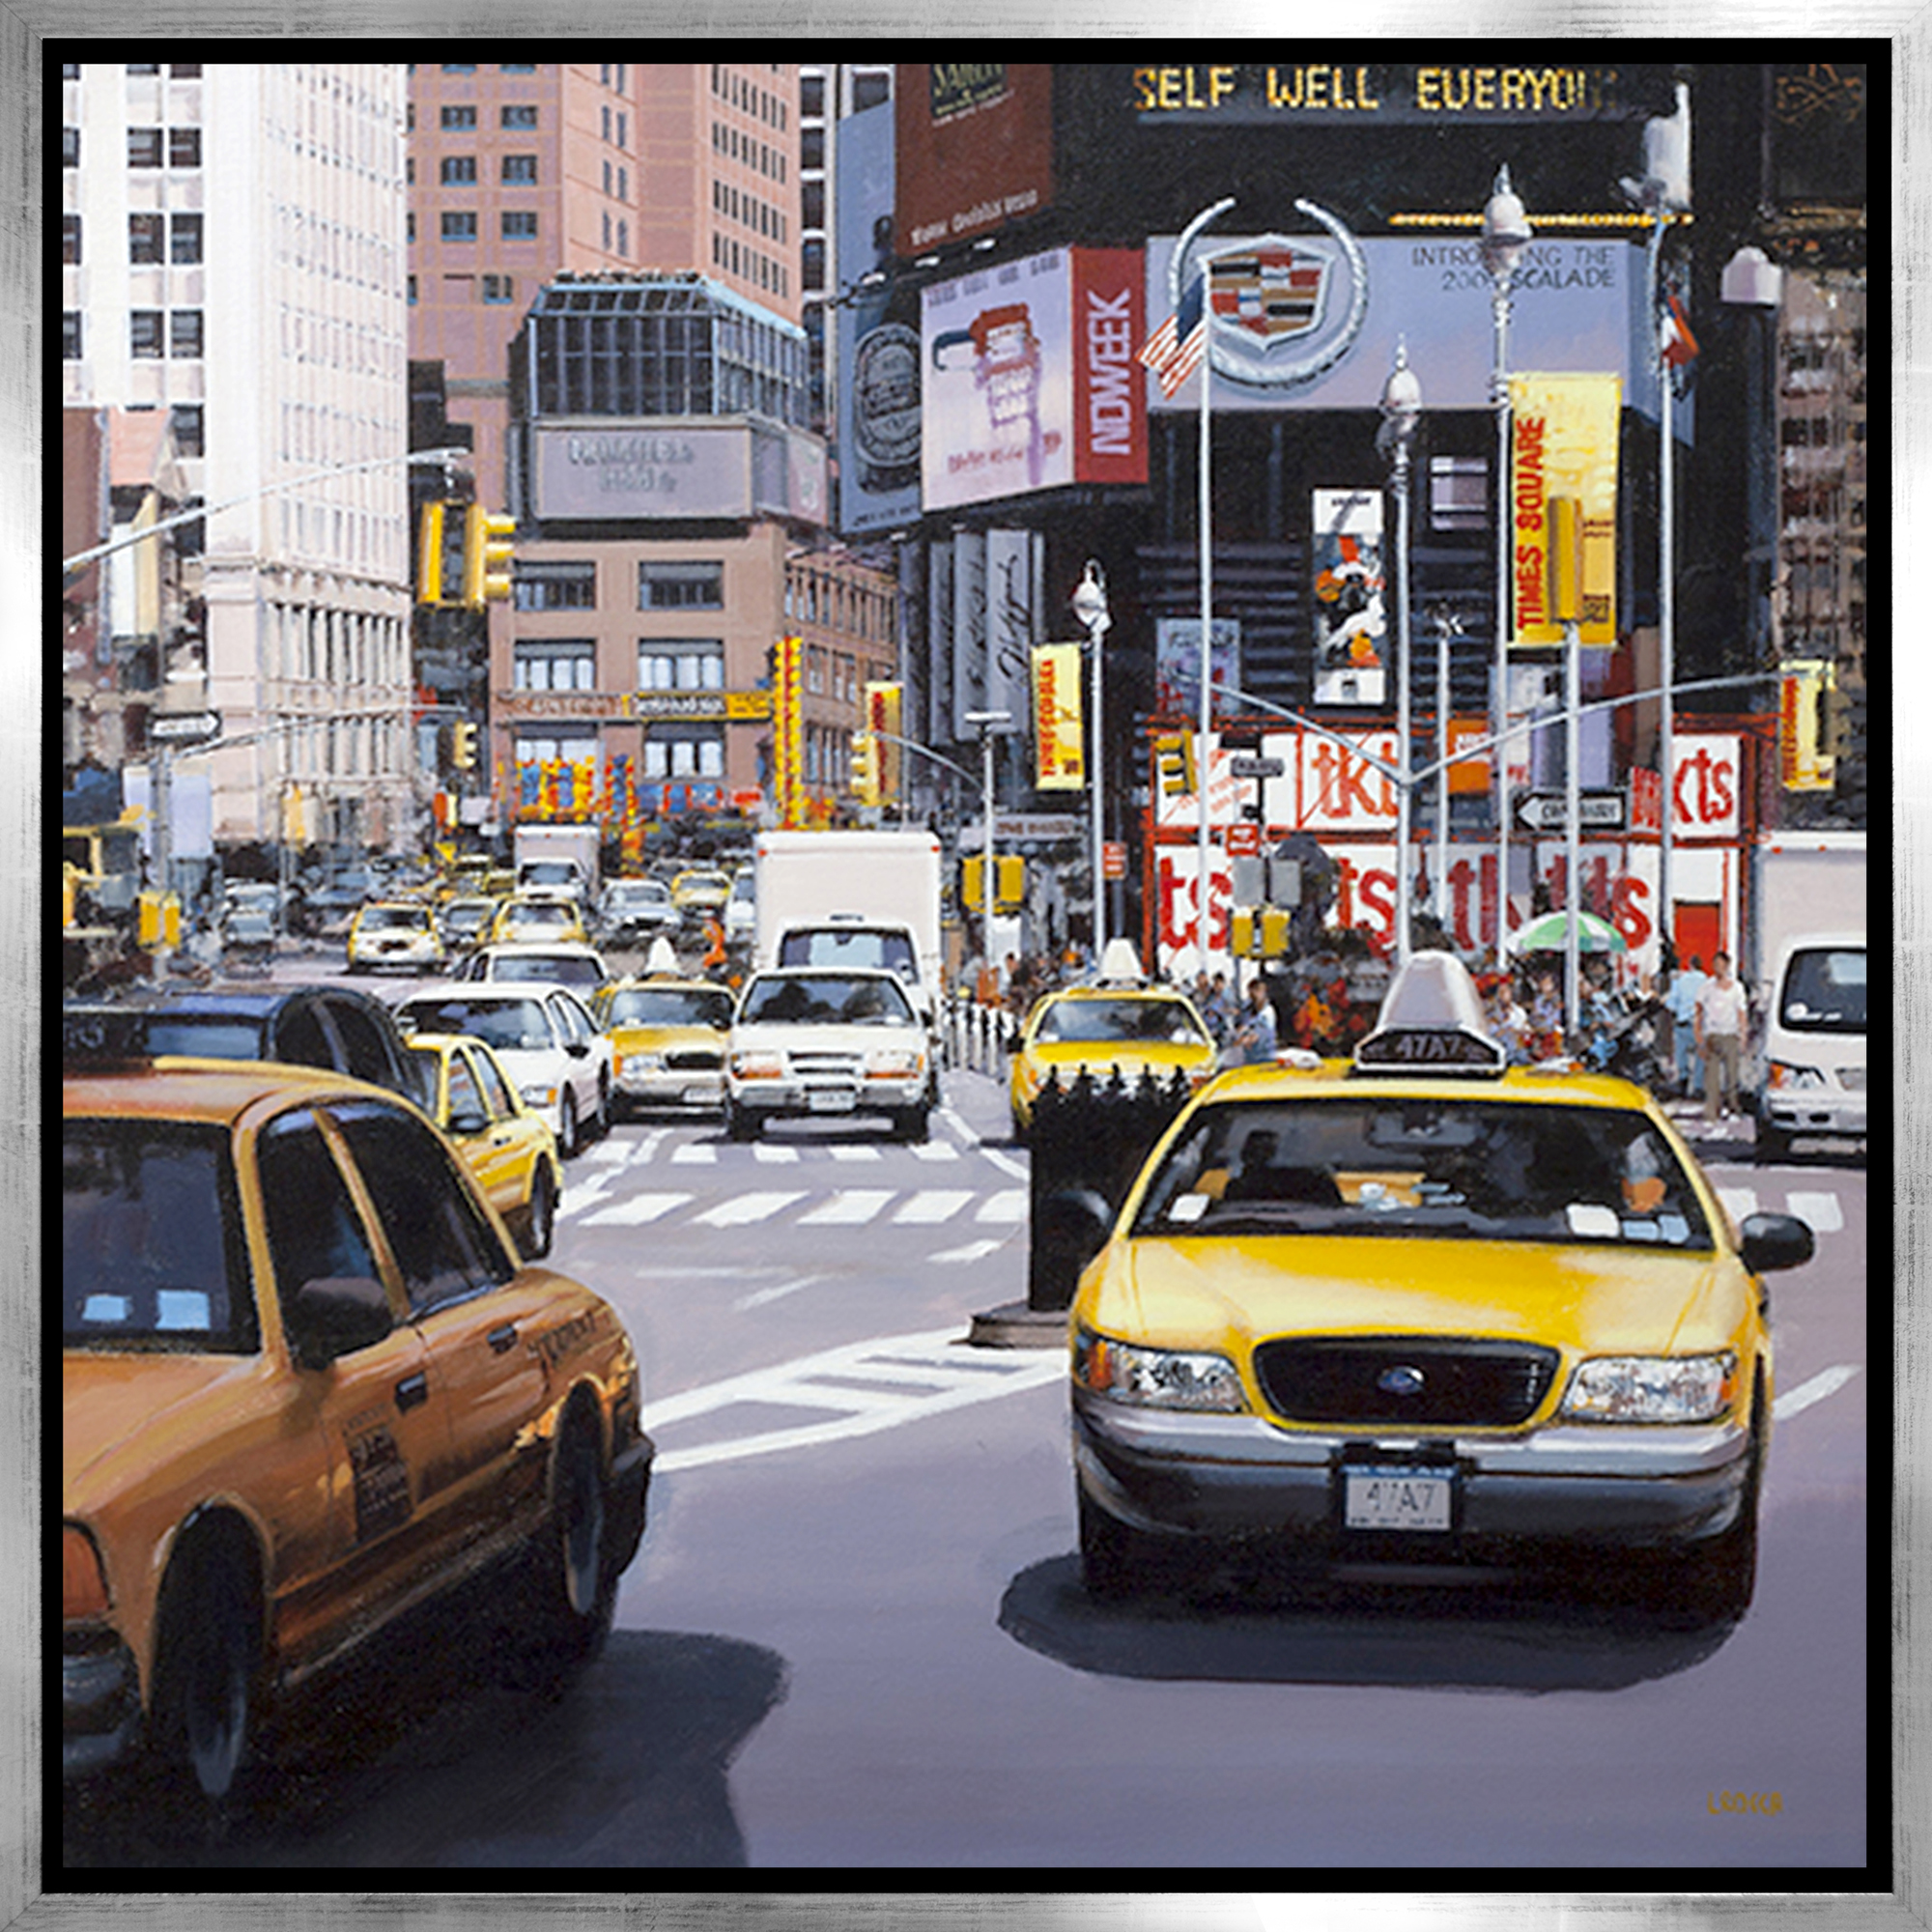 Luigi Rocca - Noweek Times Square , 6855-006-272